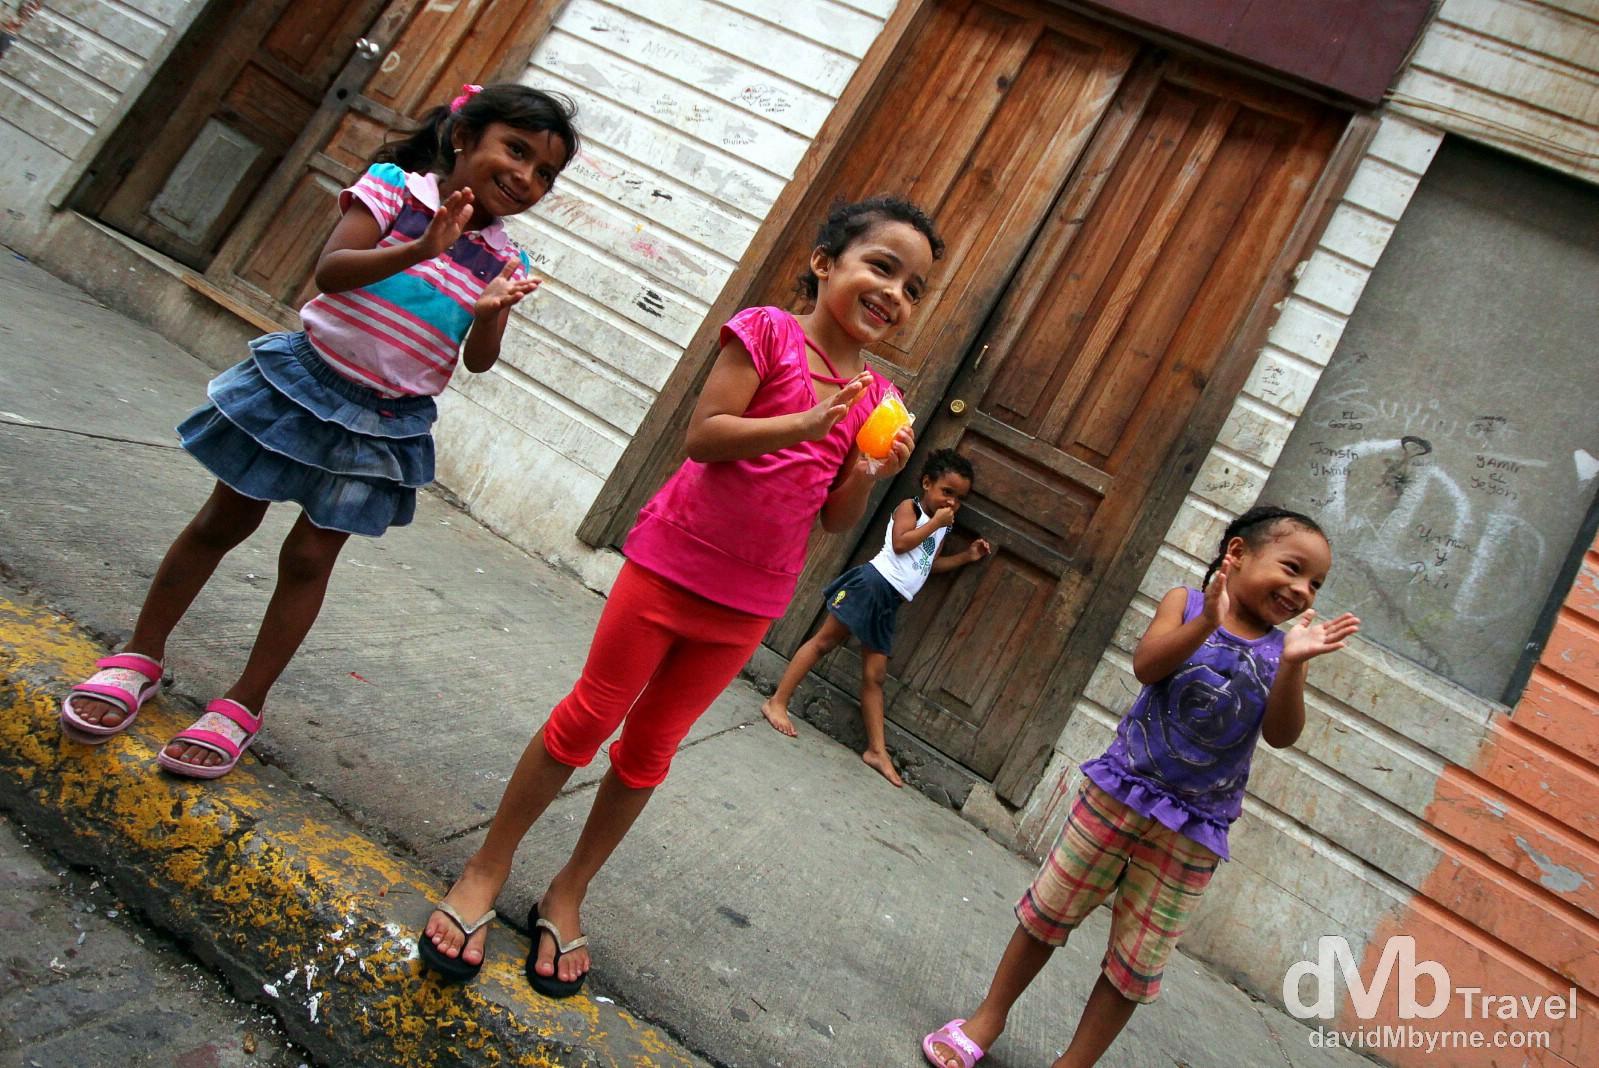 Children on the streets of Casco Viejo, Panama City, Panama. July 1st 2013.